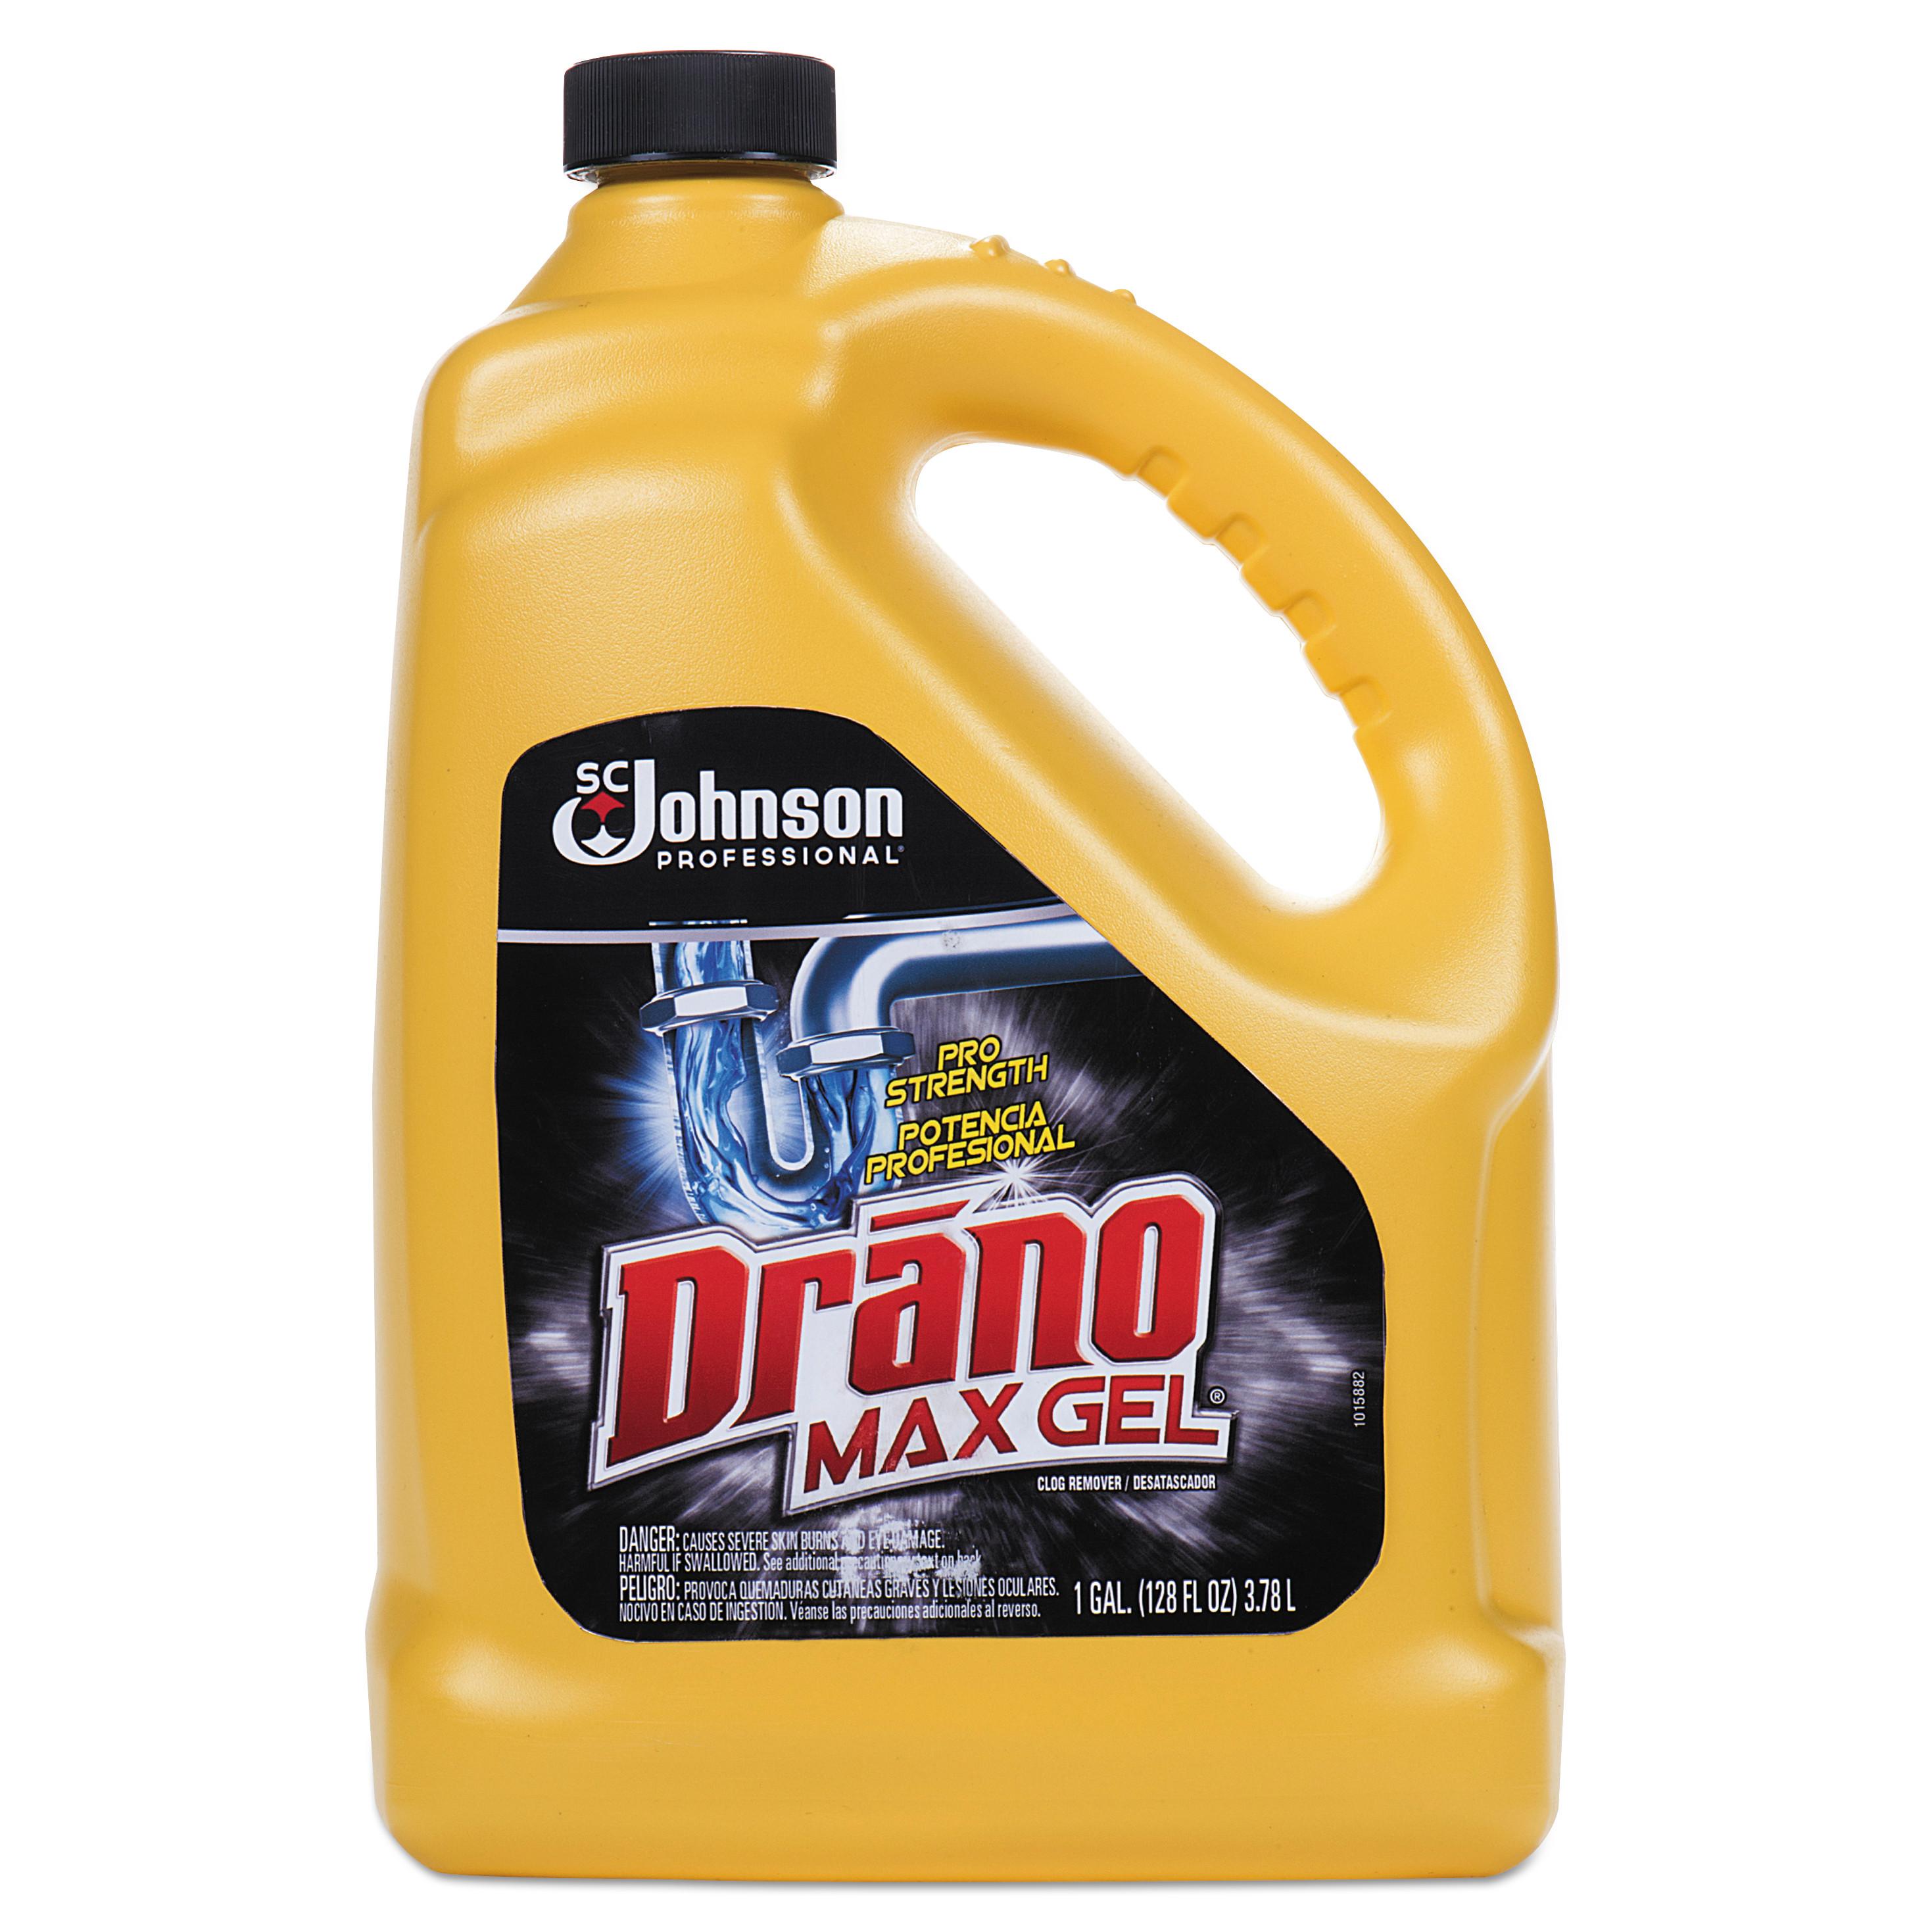 drano max gel instructions